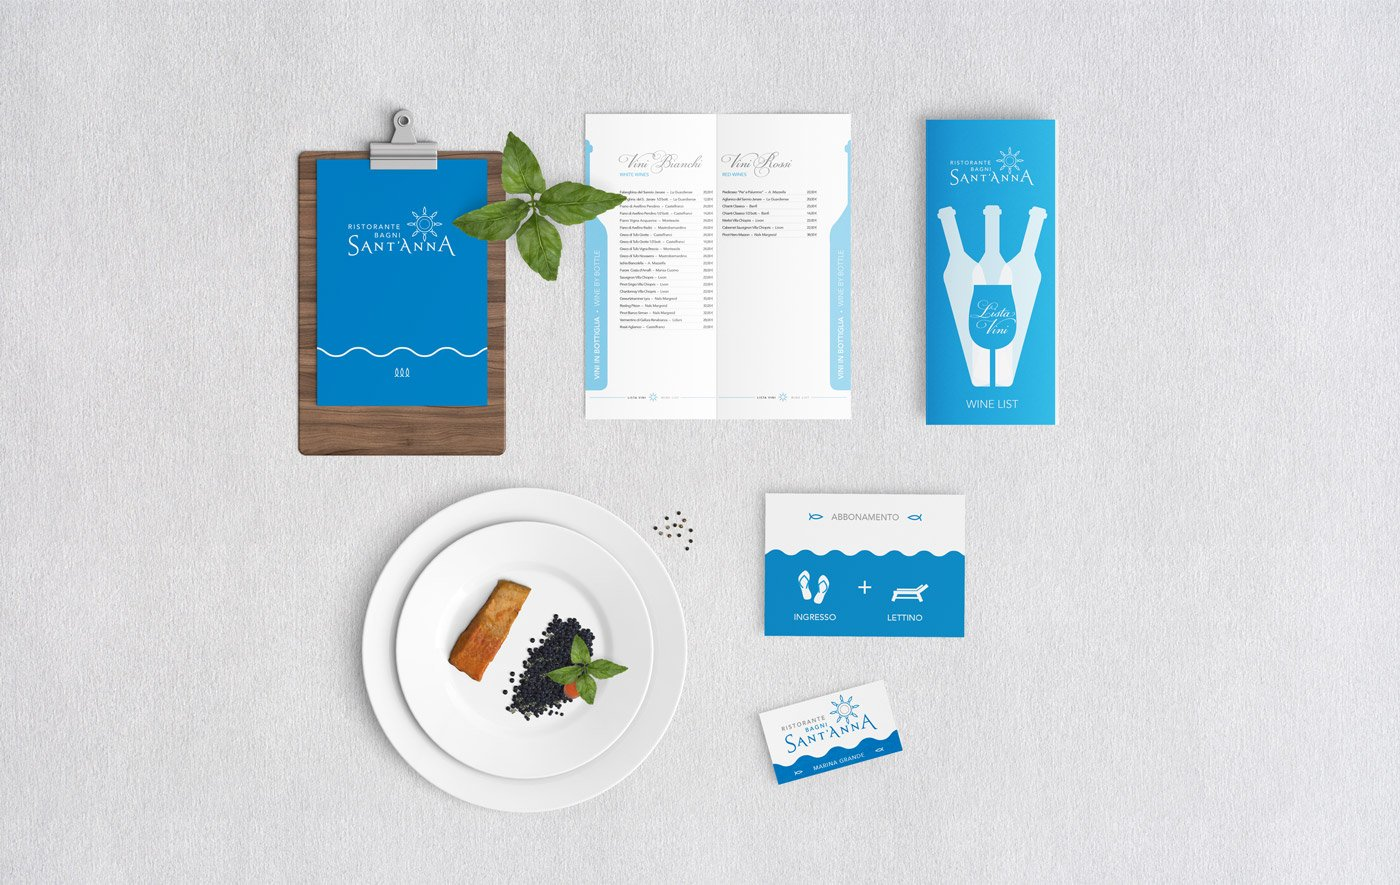 Case Study Brand Identity Design For Italian Seafood Restaurant